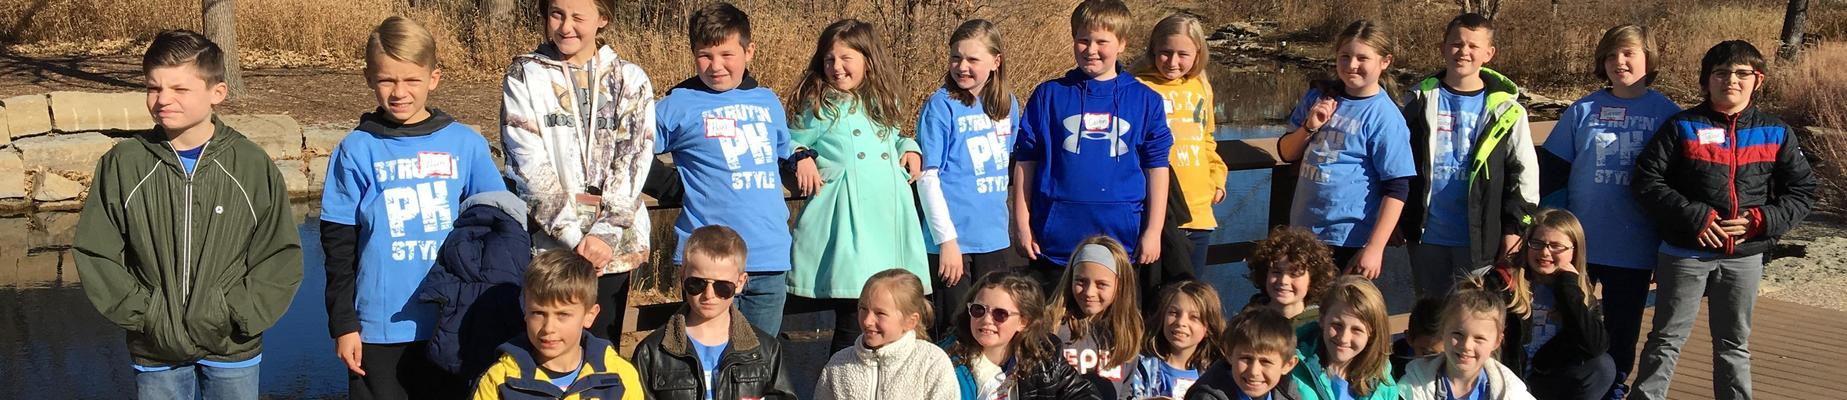 Group of kids outside for fieldtrip